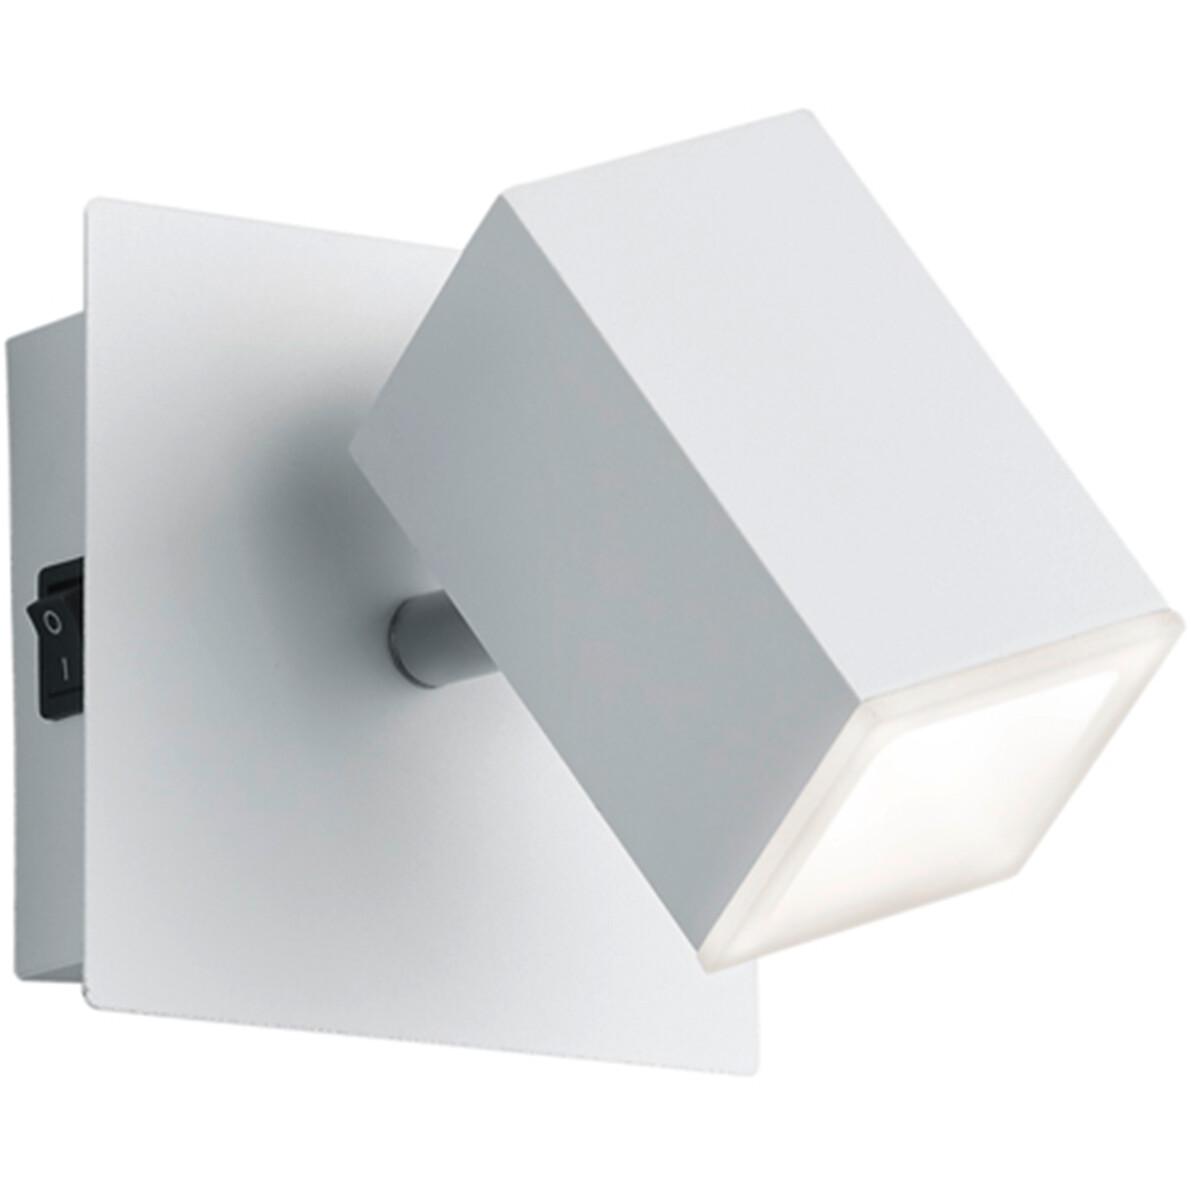 LED Wandspot - Trion Laginos - 8W - Warm Wit 3000K - 1-lichts - Vierkant - Mat Wit - Aluminium